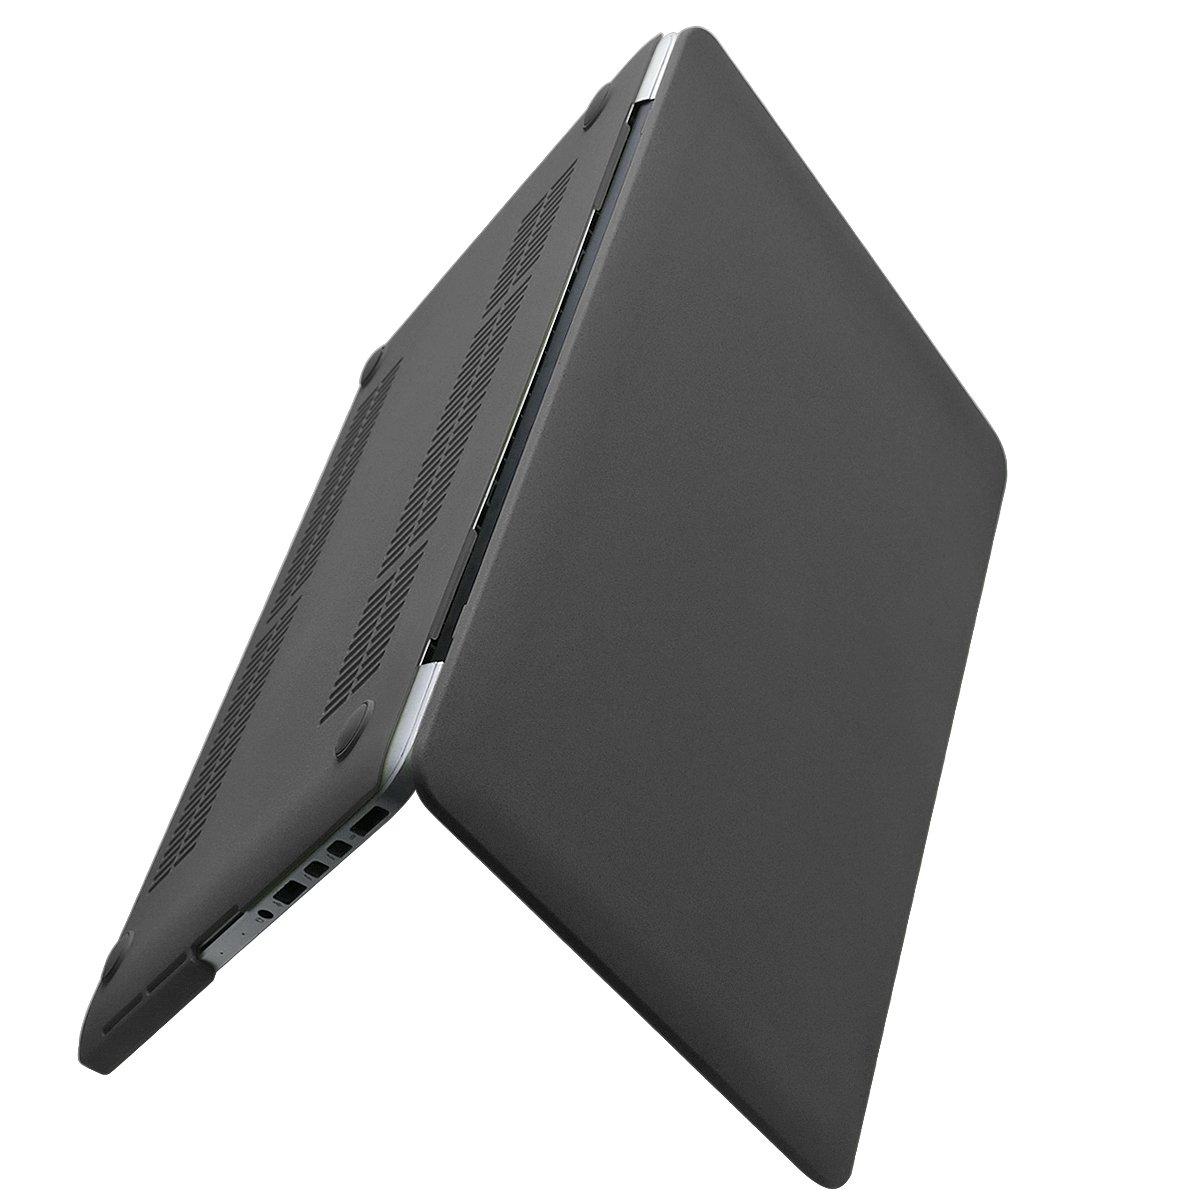 Macbook Pro 15インチRetinaケース( CD - ROMドライブなし) – Ximeng滑らかなソフトPUレザーコーティングハードシェル保護ケースカバーfor MacBook Pro 15インチwith Retina Display ( A1398 ) (Macbook Retina 15 inch, Black) B072TZ2GQY Macbook Retina 15 inch|Black Black Macbook Retina 15 inch